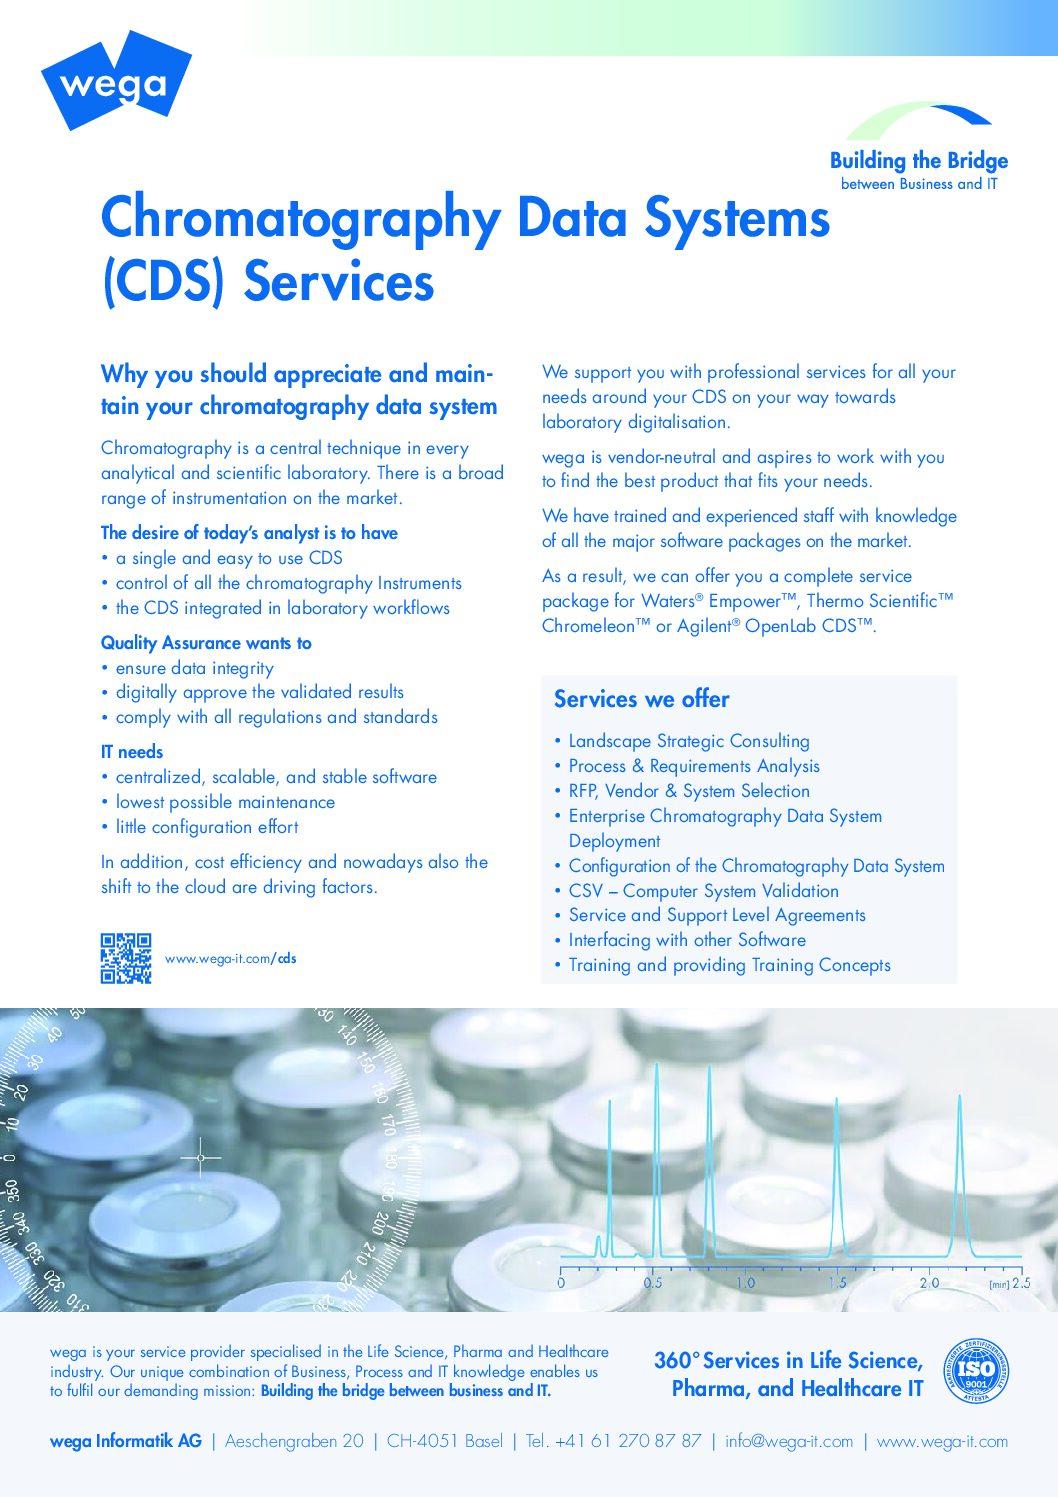 CDS services